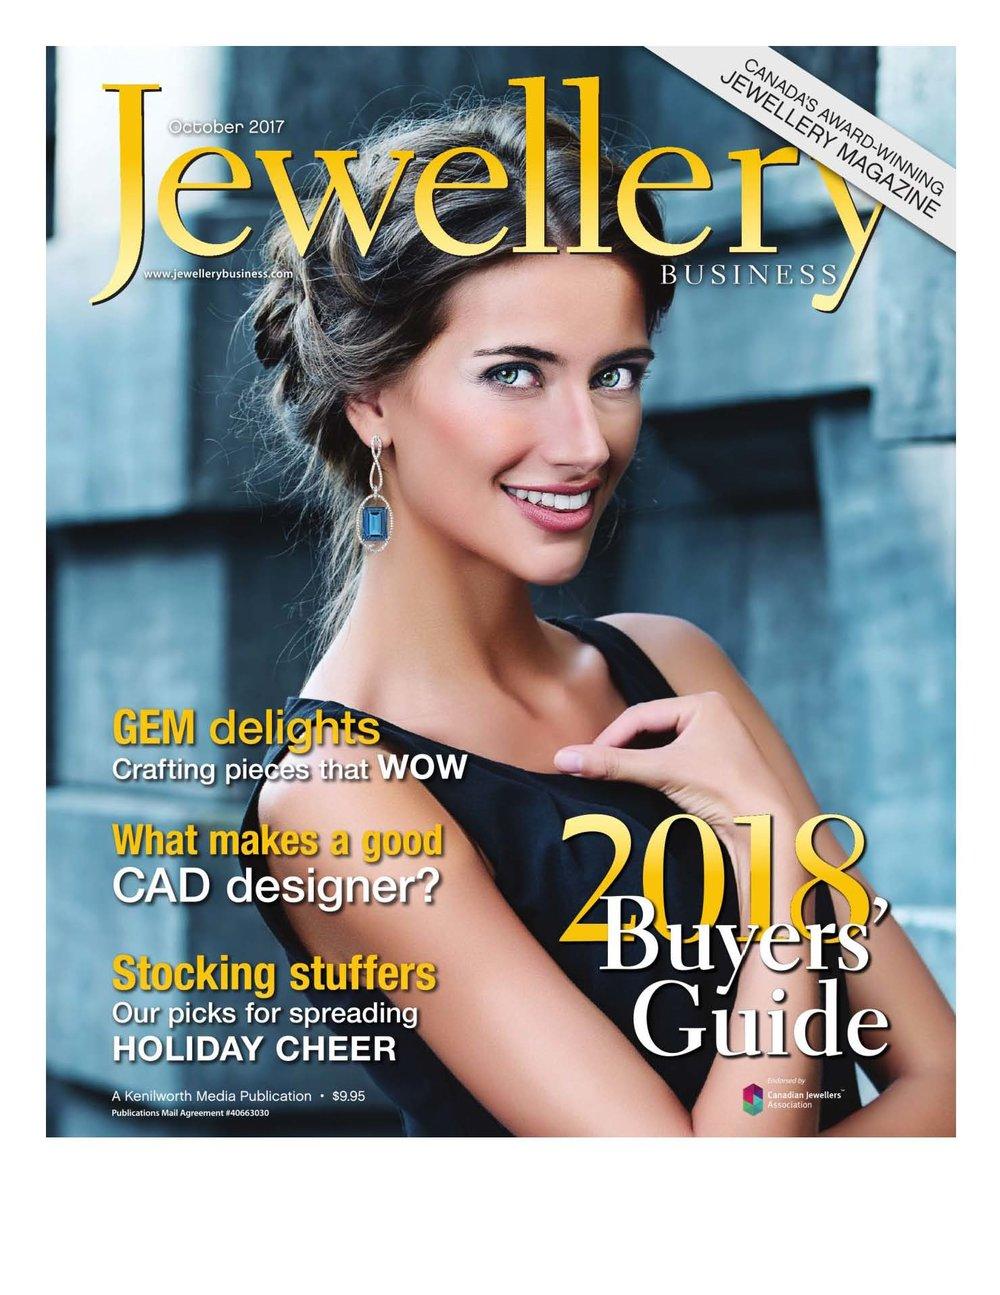 Anne Sportun featured in Jewellery Magazine